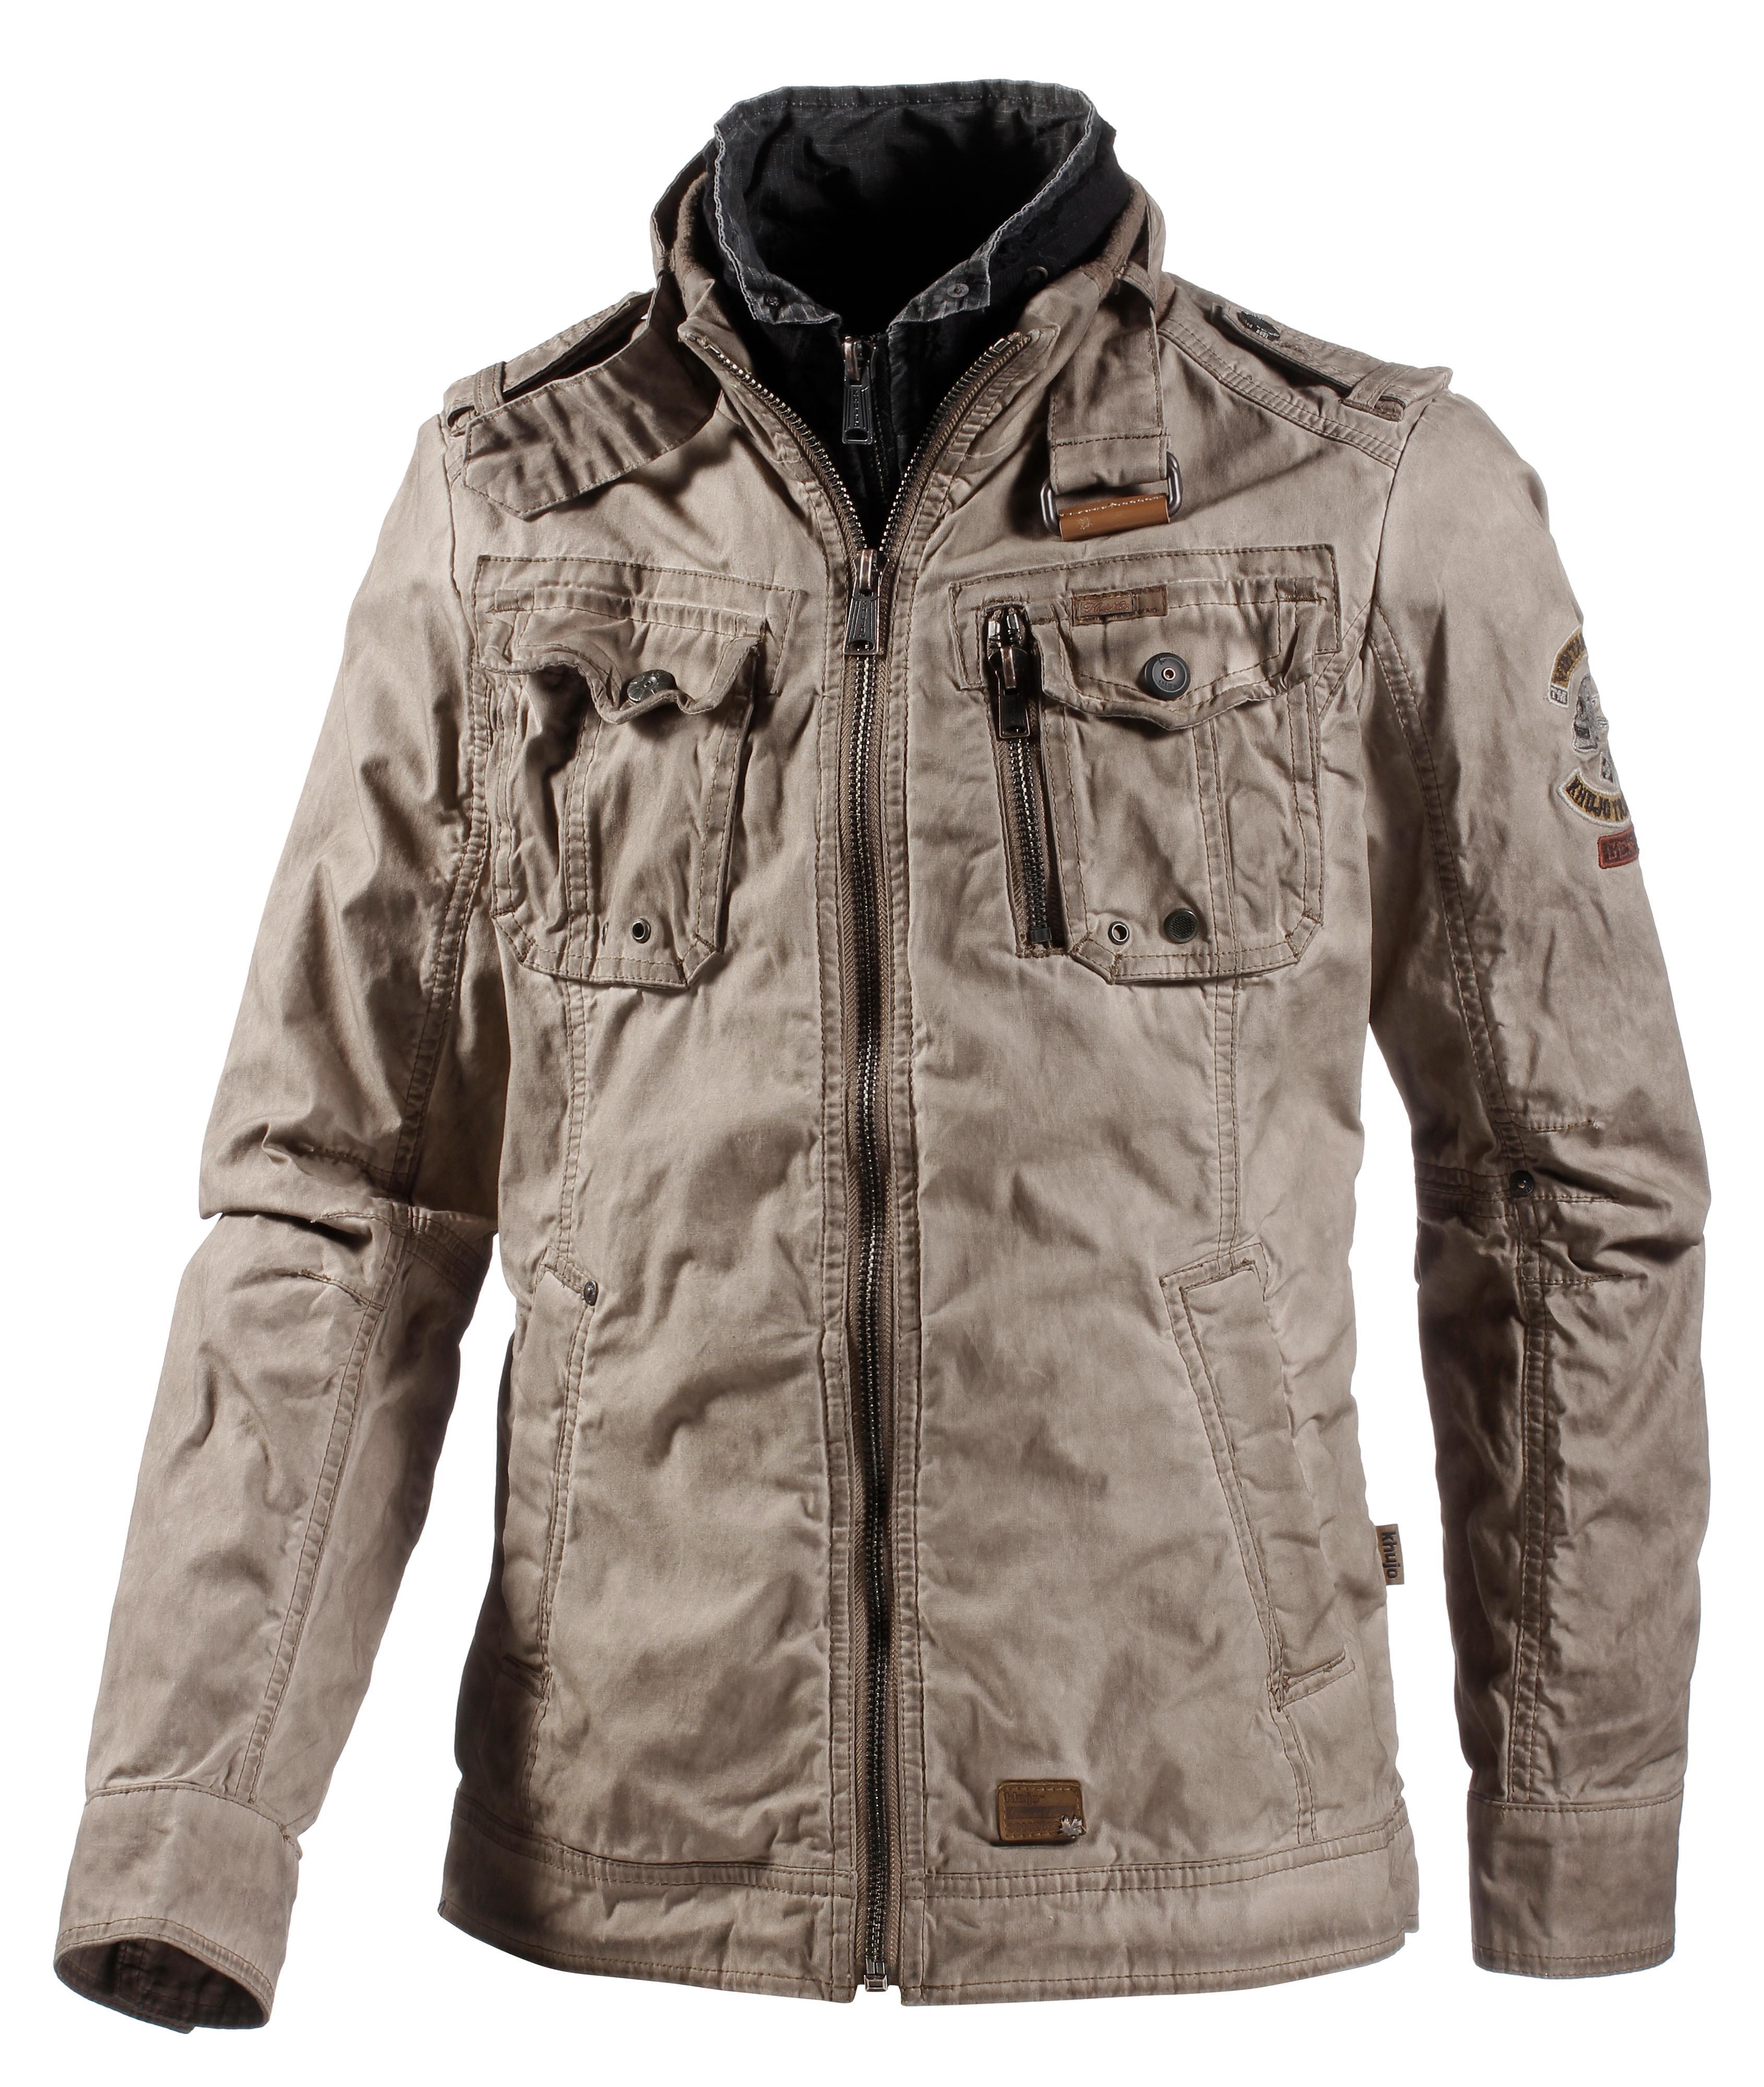 Khujo herren jacke uniform